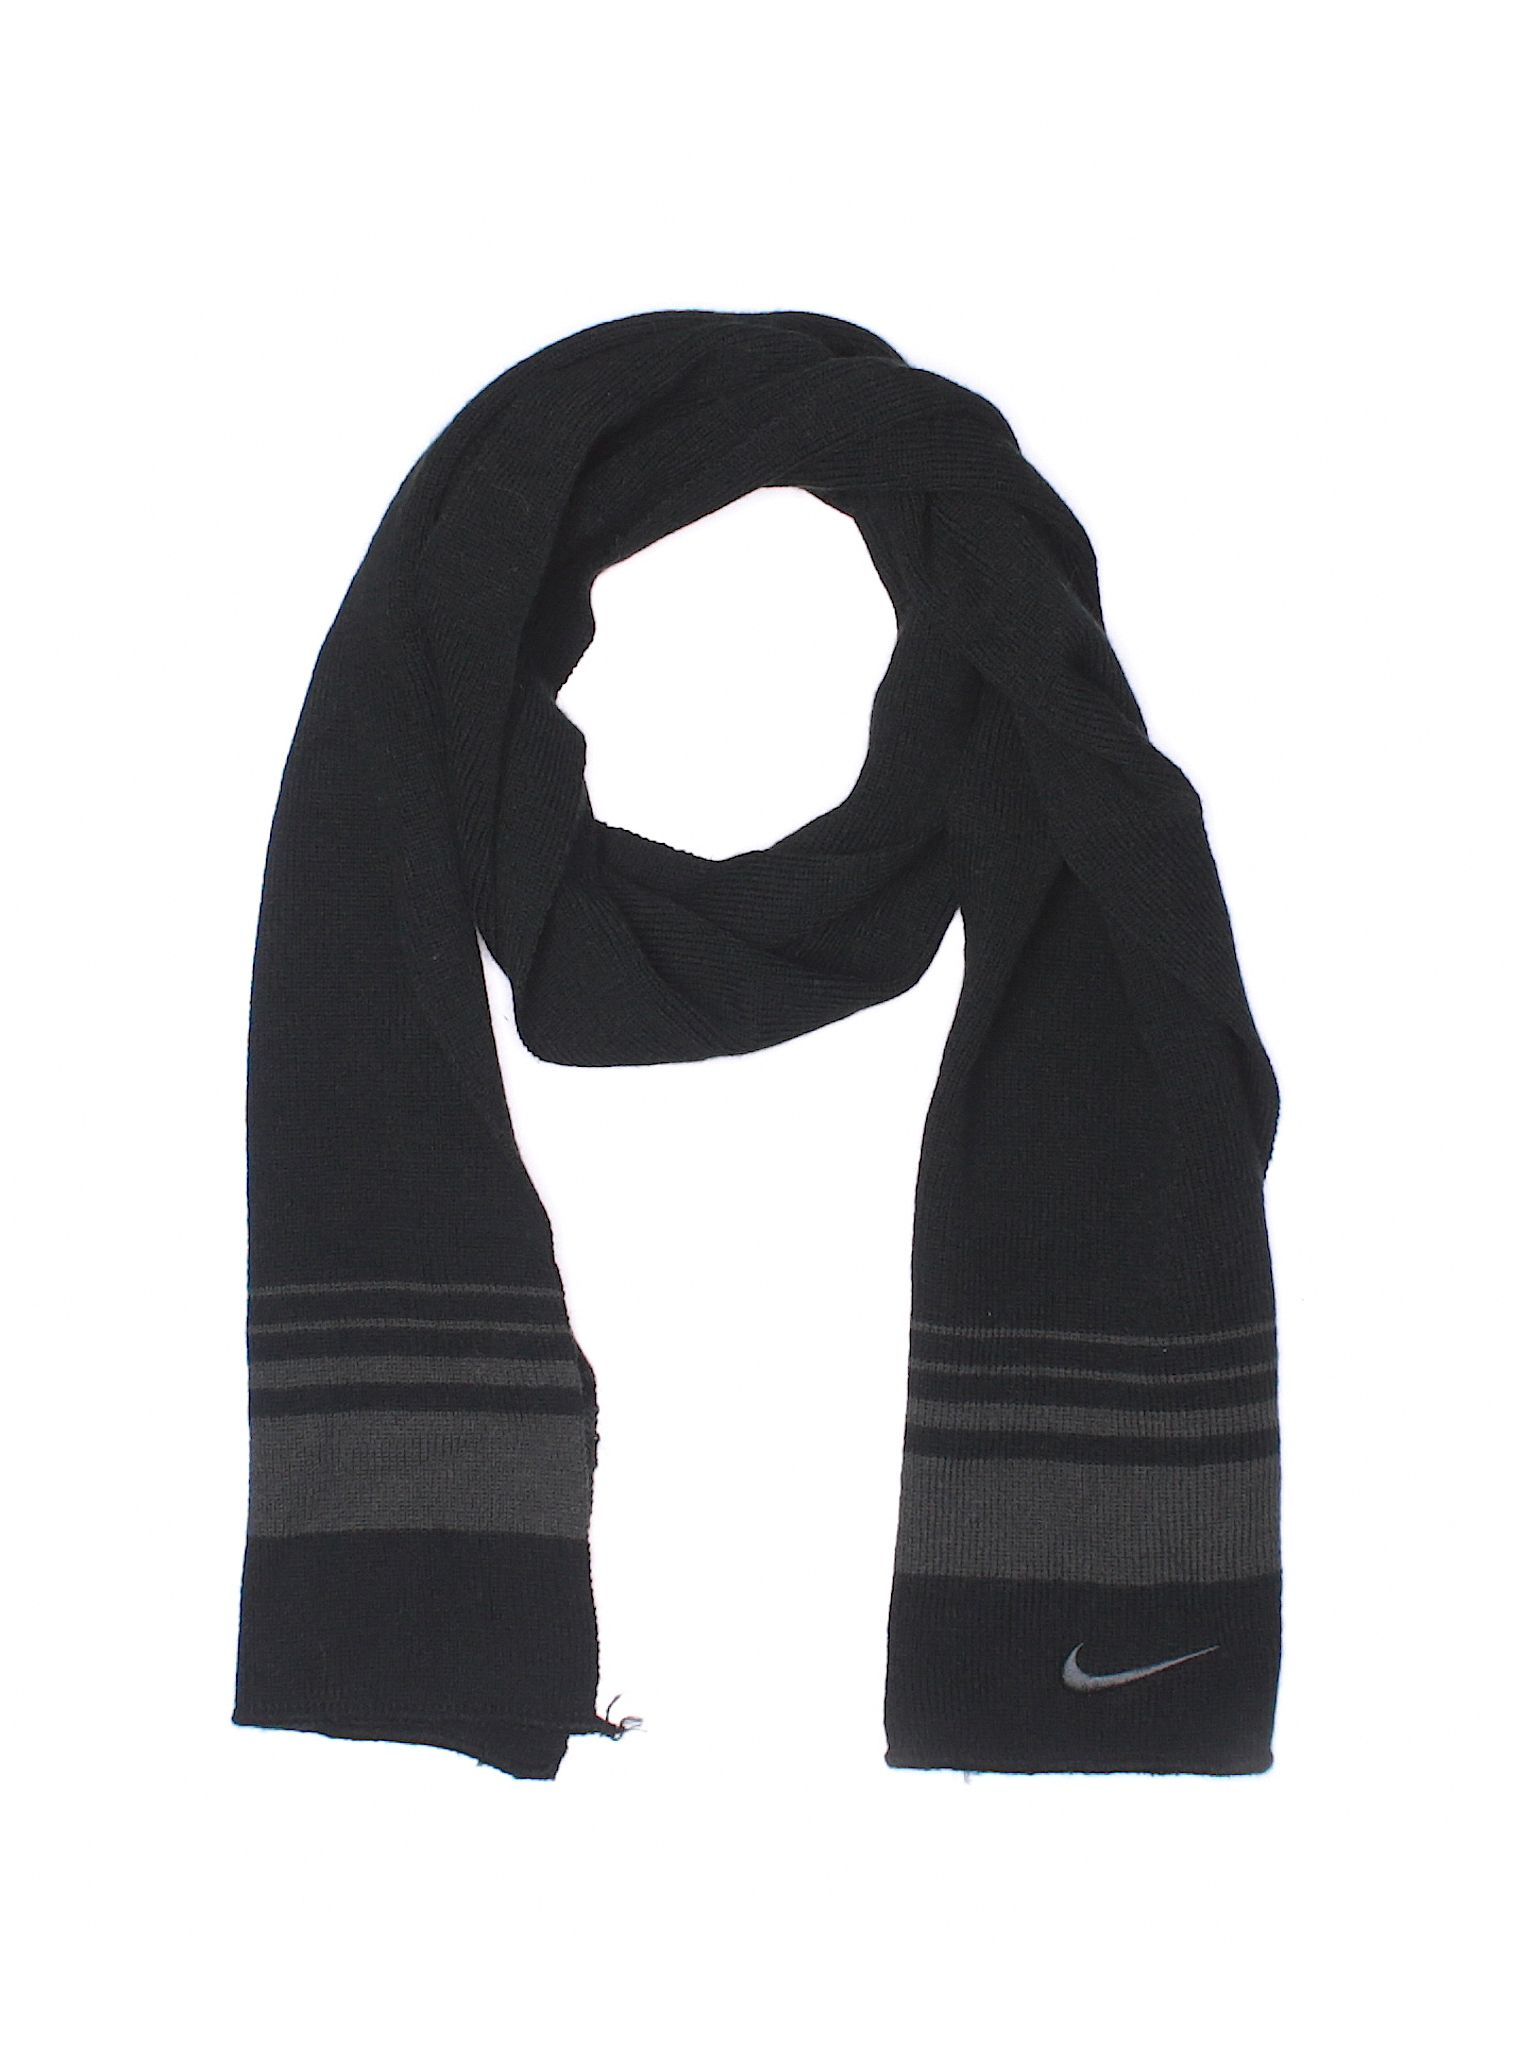 Nike Scarf  Size 0.00 Black Women s Accessories -  15.99 3b1b17d5a